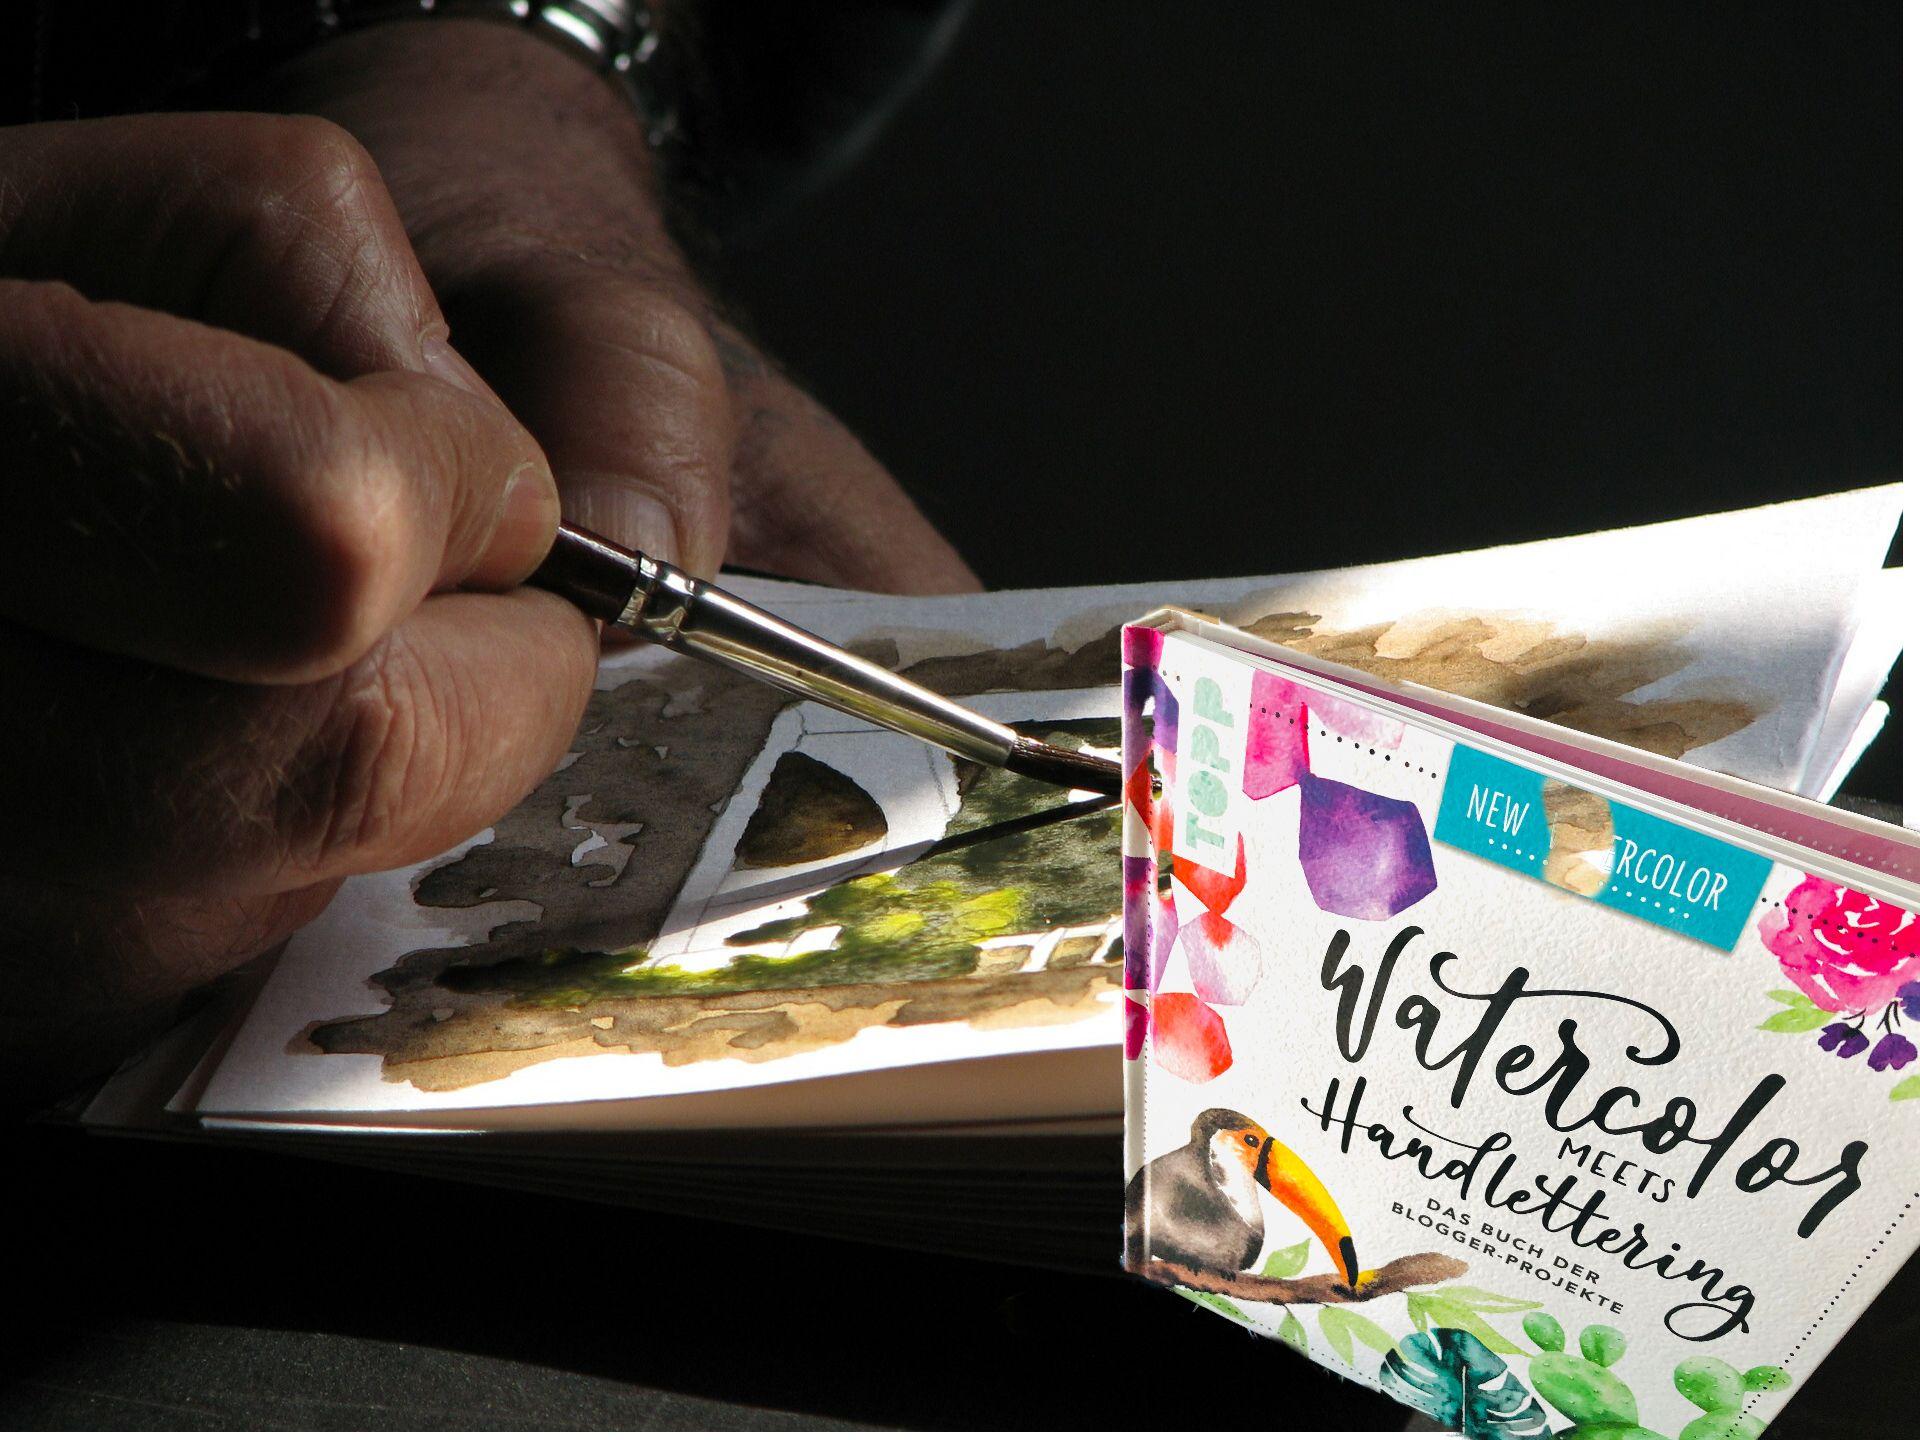 Watercolor Meets Handlettering Ein Feines Buch Fur Aquarell